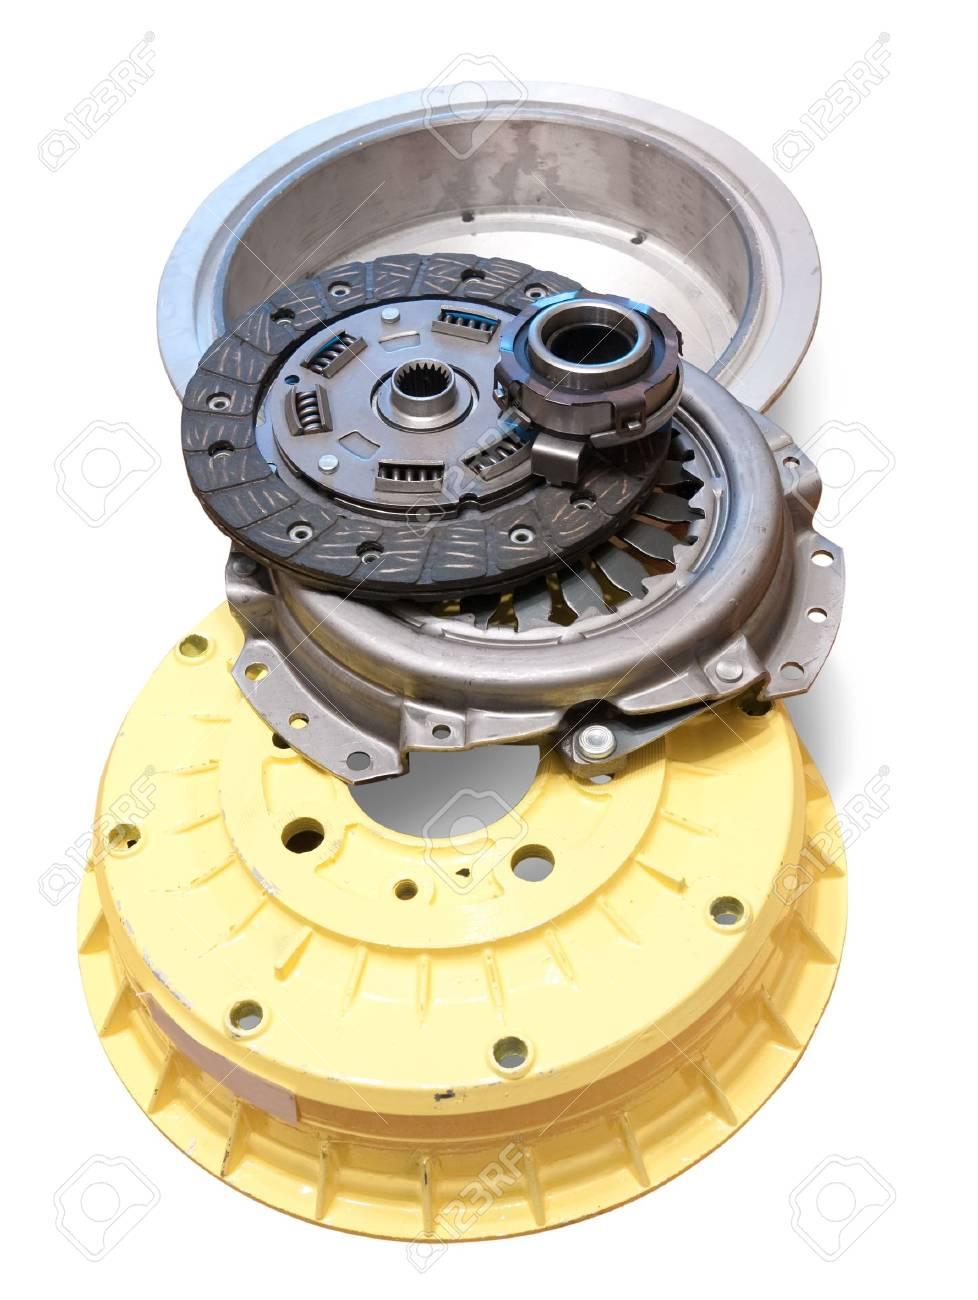 automotive parts. Stock Photo - 4843575